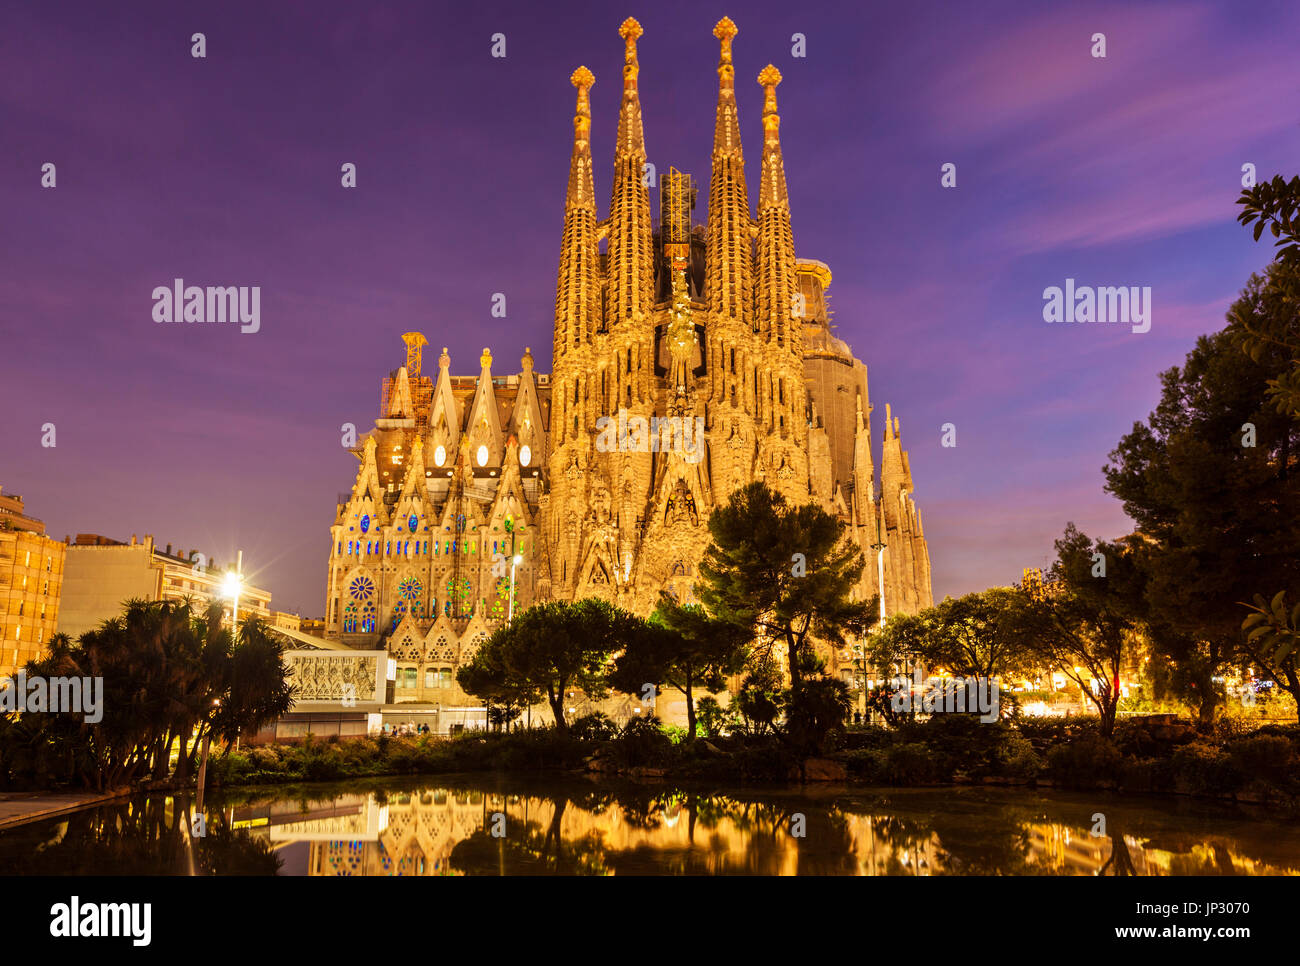 Spain Barcelona Spain Barcelona antoni gaudi sagrada familia Barcelona la sagrada familia cathedral Barcelona Spain catalunya catalonia eu Europe - Stock Image